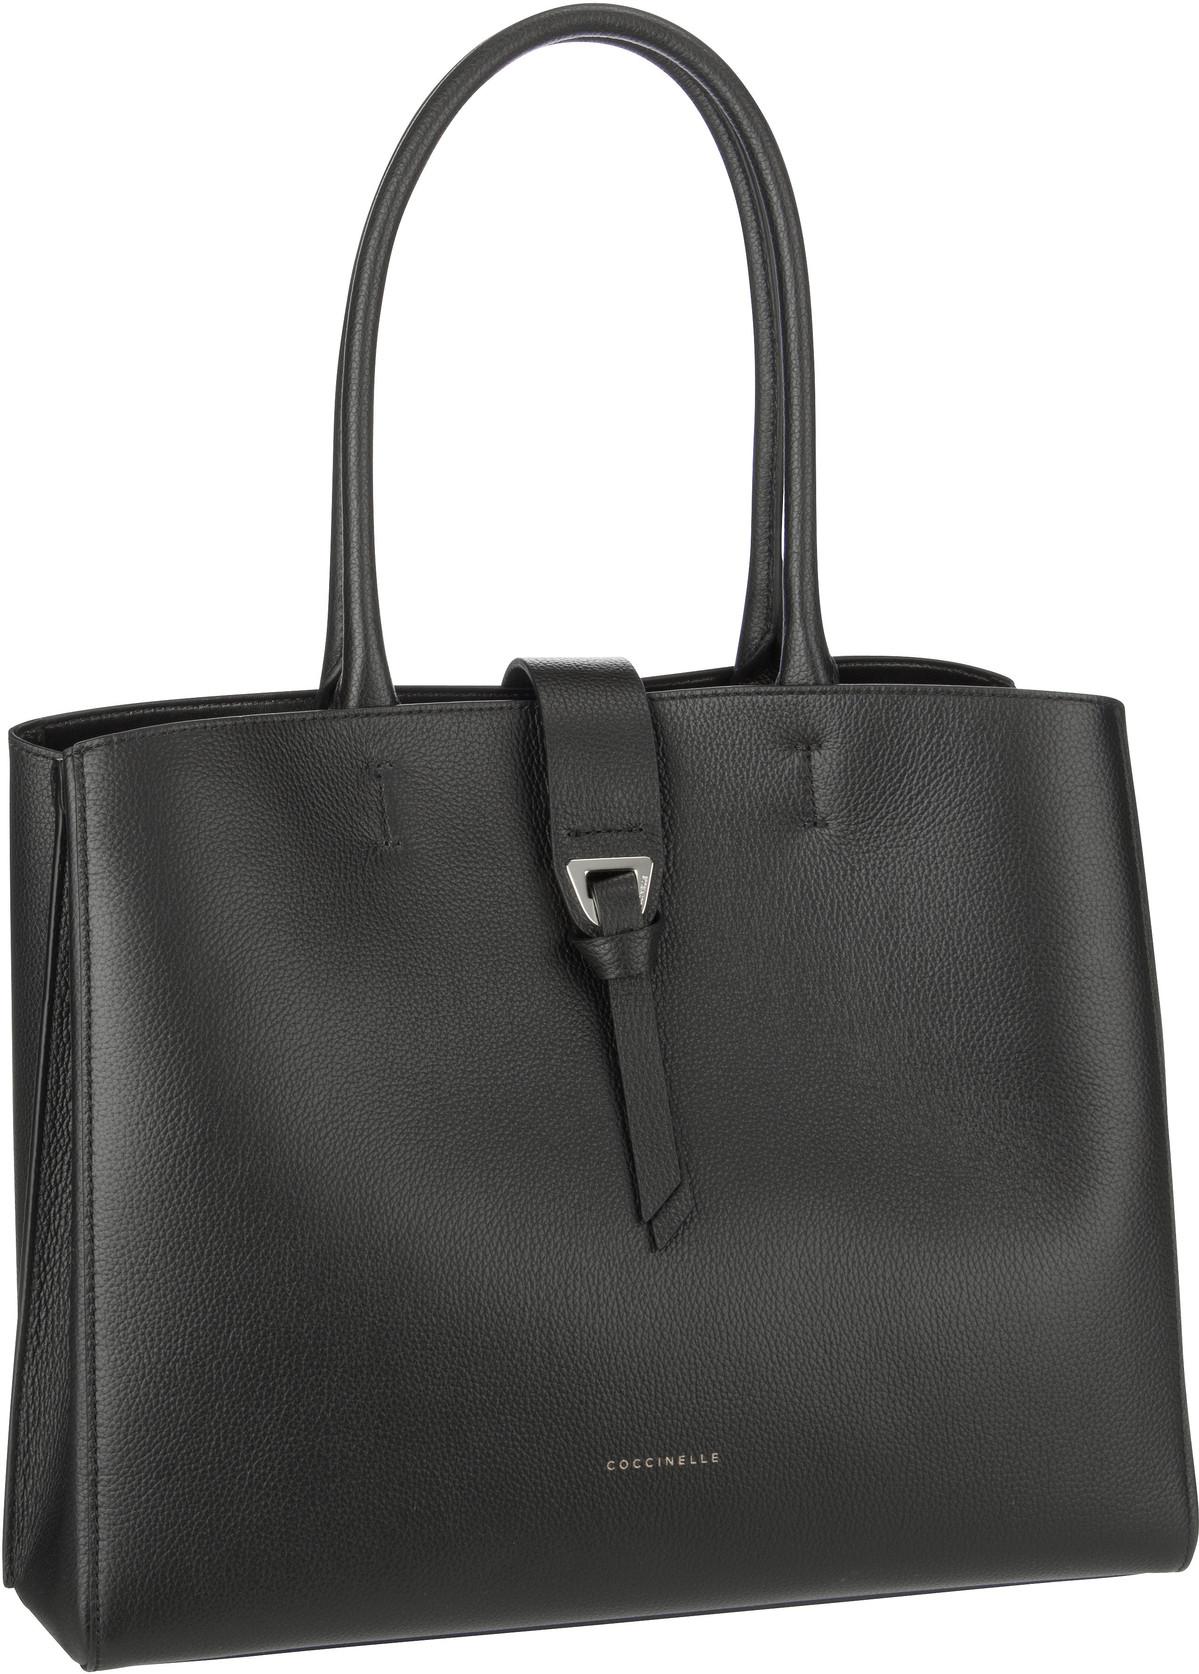 Handtasche Alba 1101 Nero